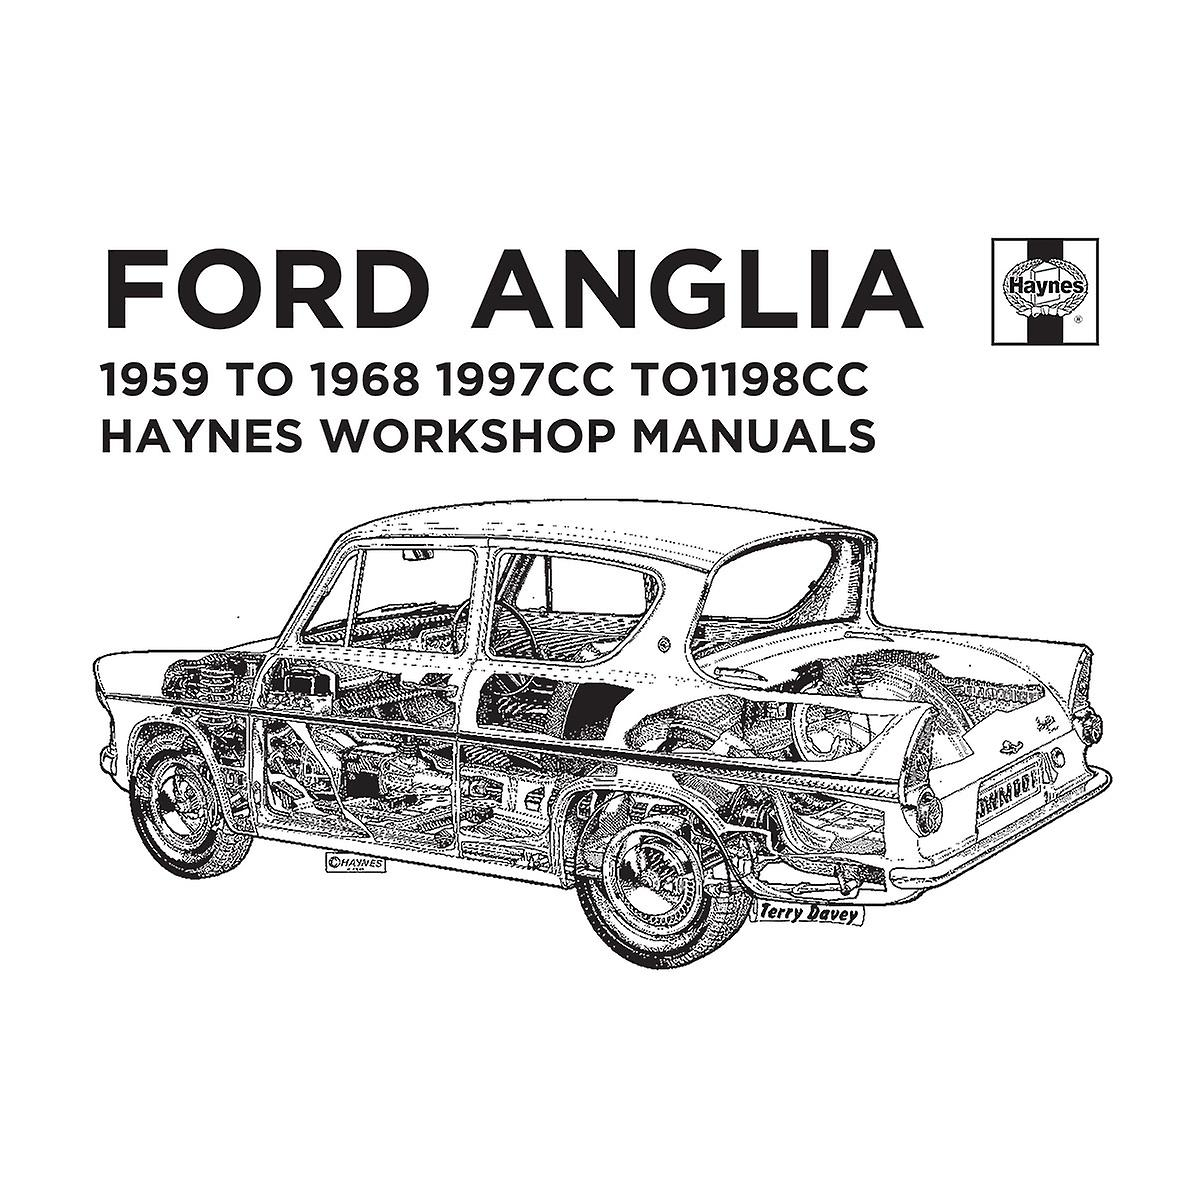 Haynes Workshop Manual 0001 Ford Anglia Black Men's